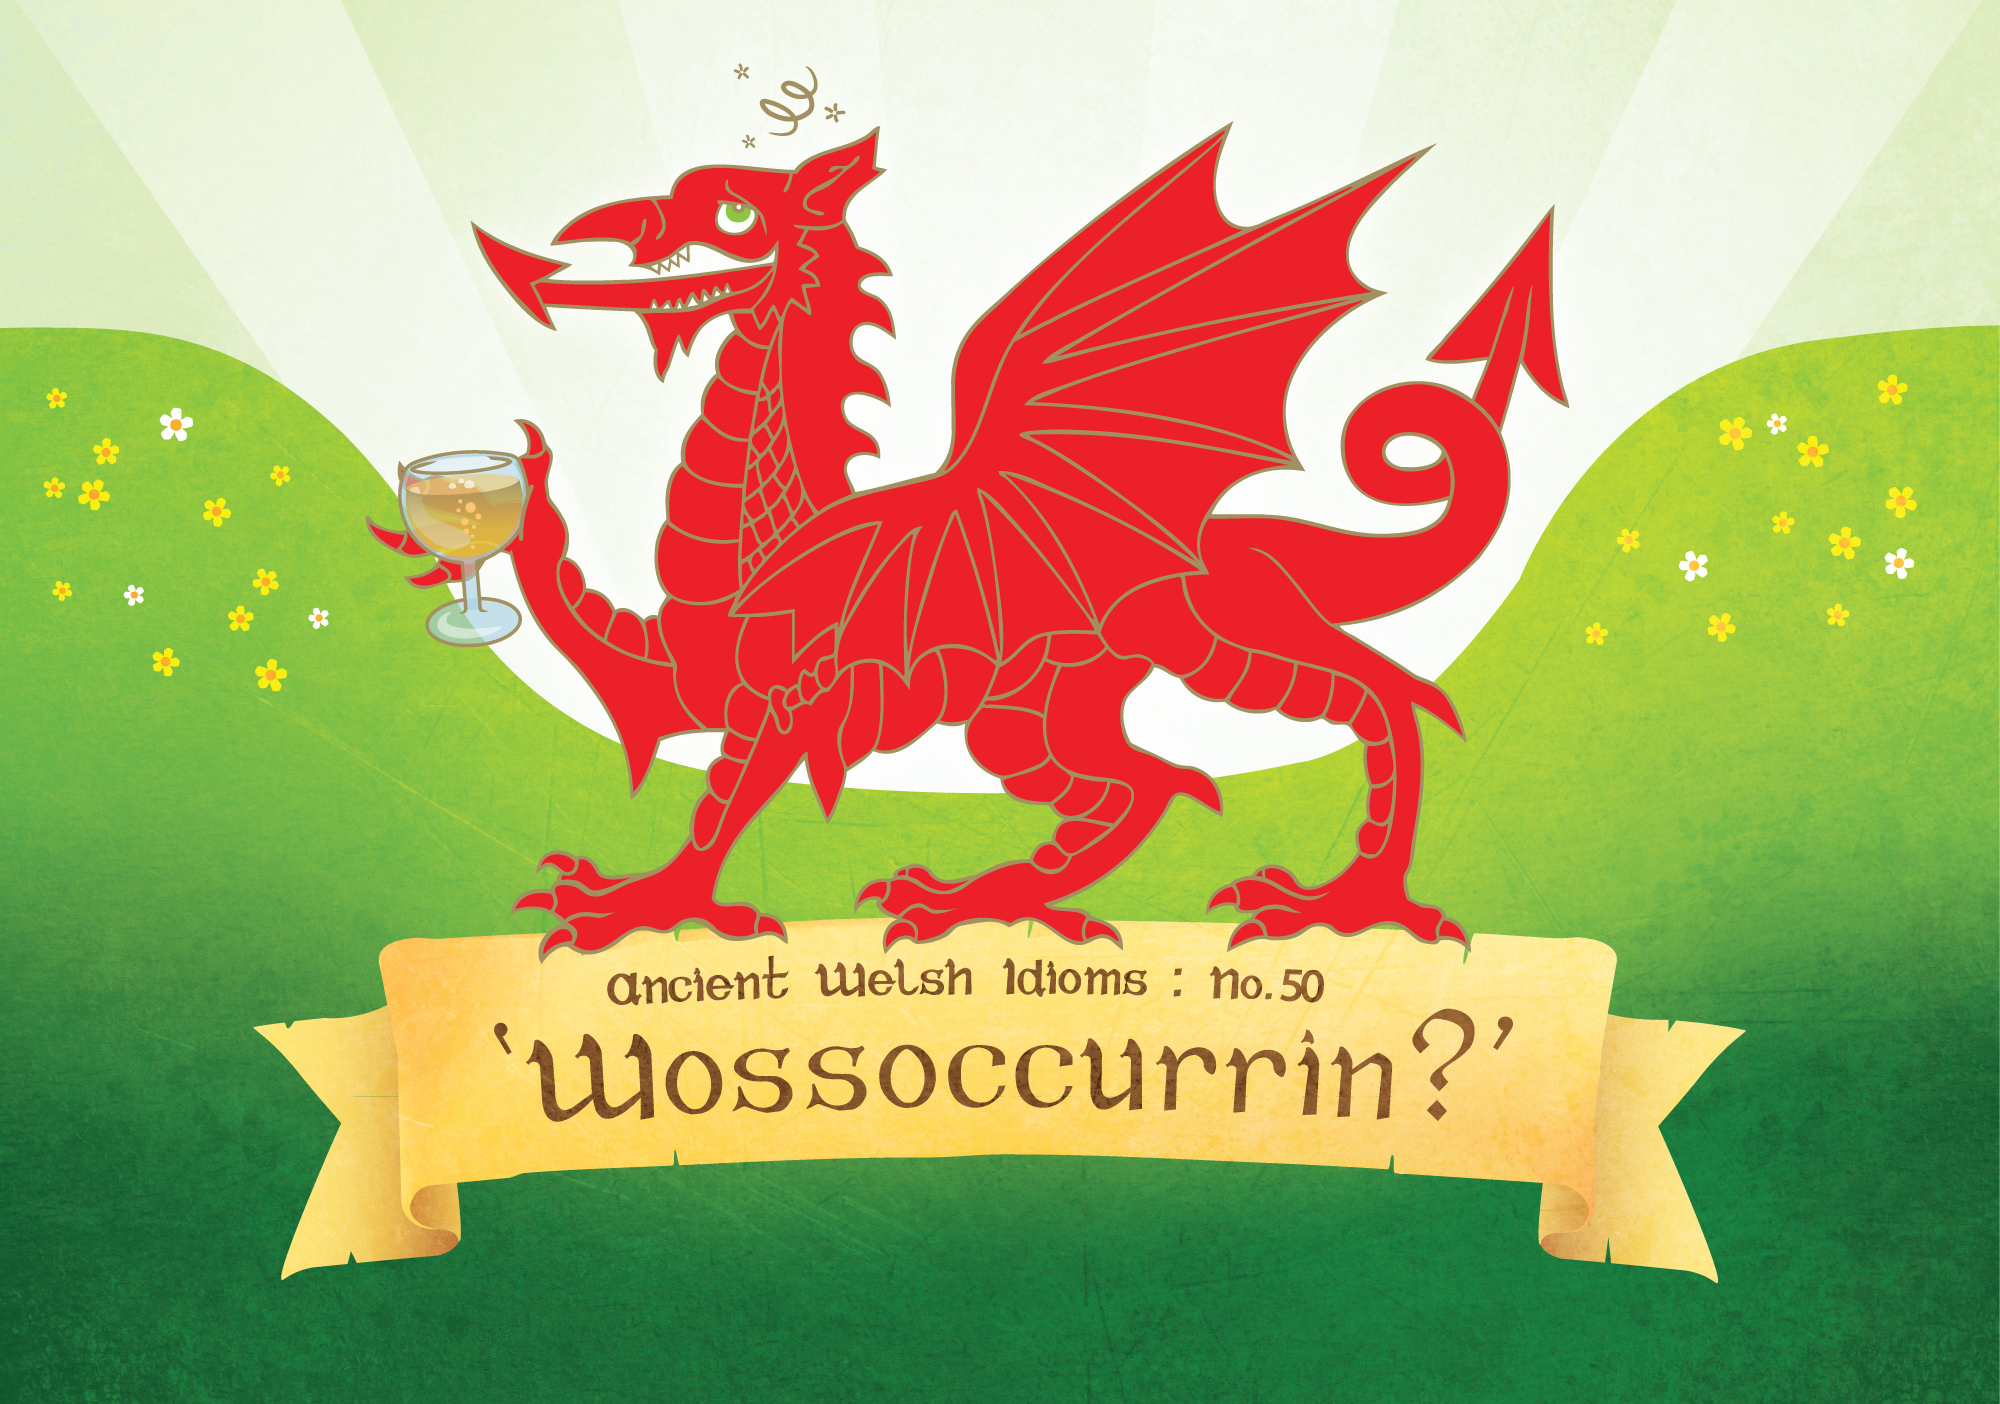 """Wossoccurrin?"""